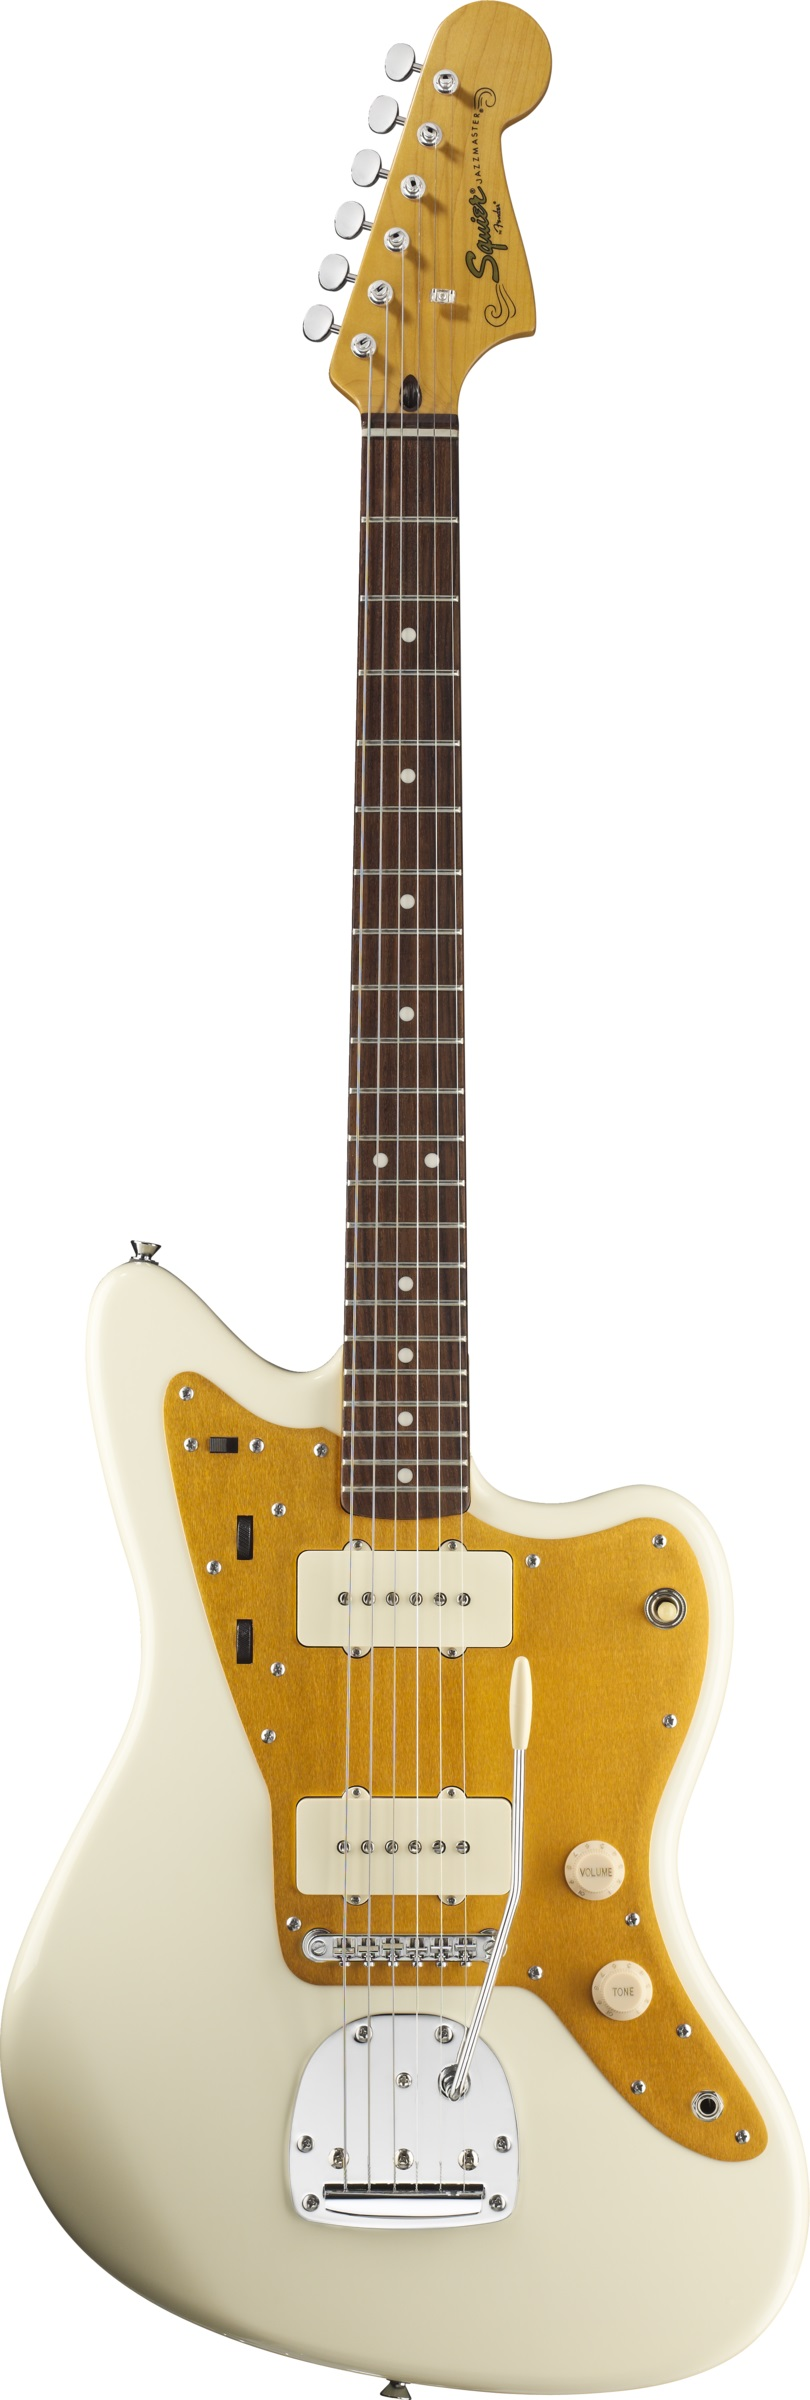 Đàn Guitar Squier J Mascis Jazzmaster, Vintage White